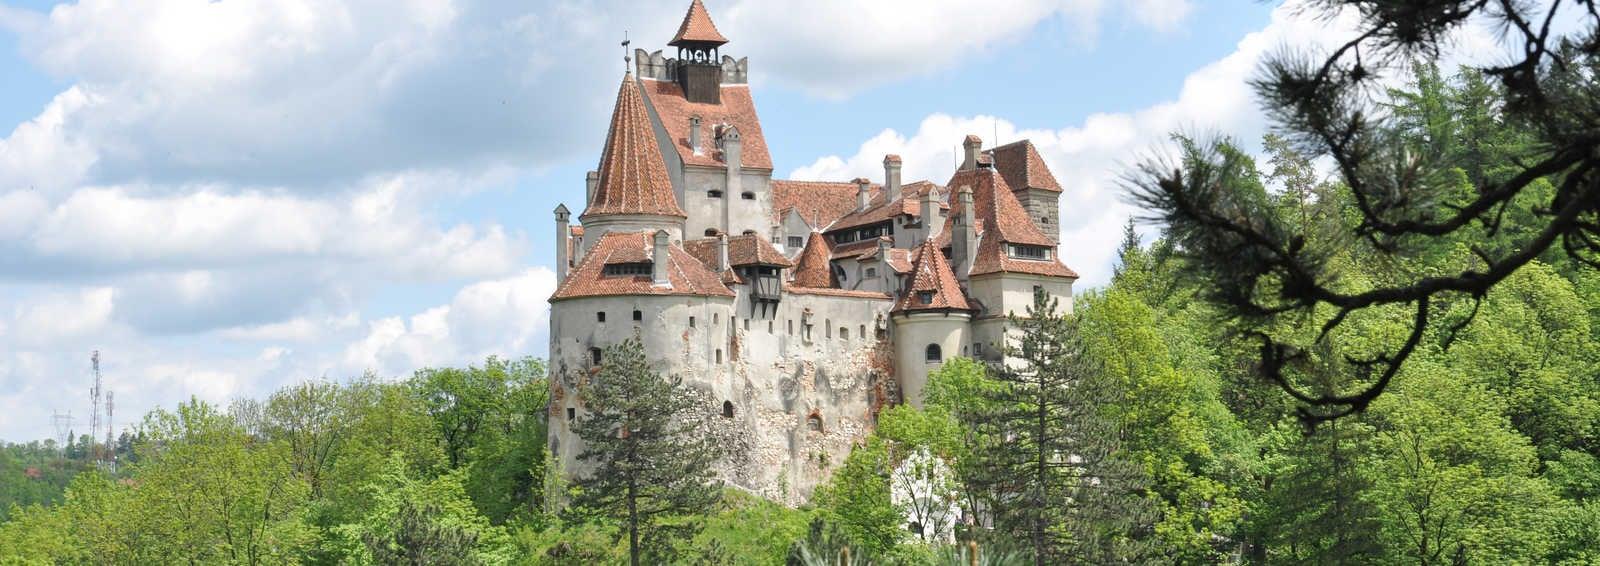 Count Dracula's castle; Bran Castle, Romania